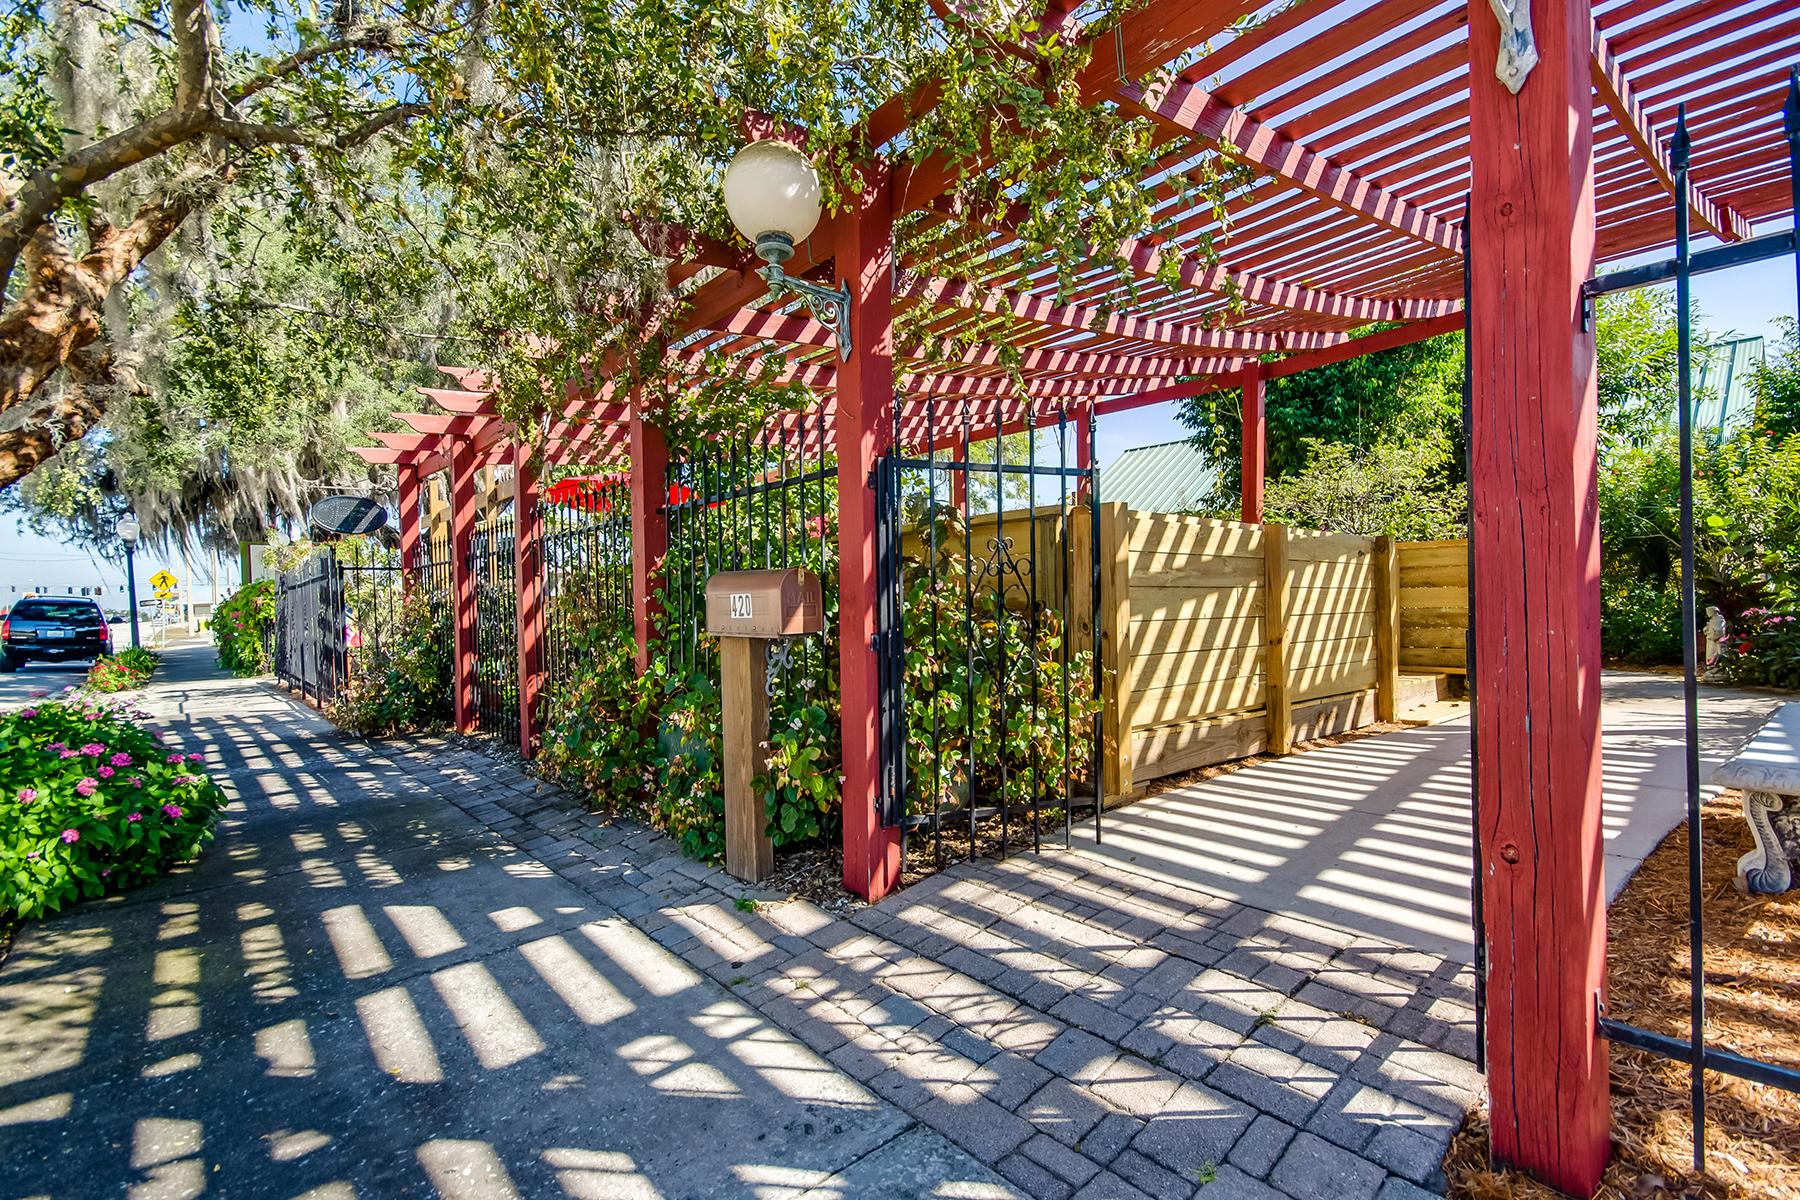 Additional photo for property listing at SEBRING FLORIDA 420 N Ridgewood Dr,  Sebring, Florida 33870 United States